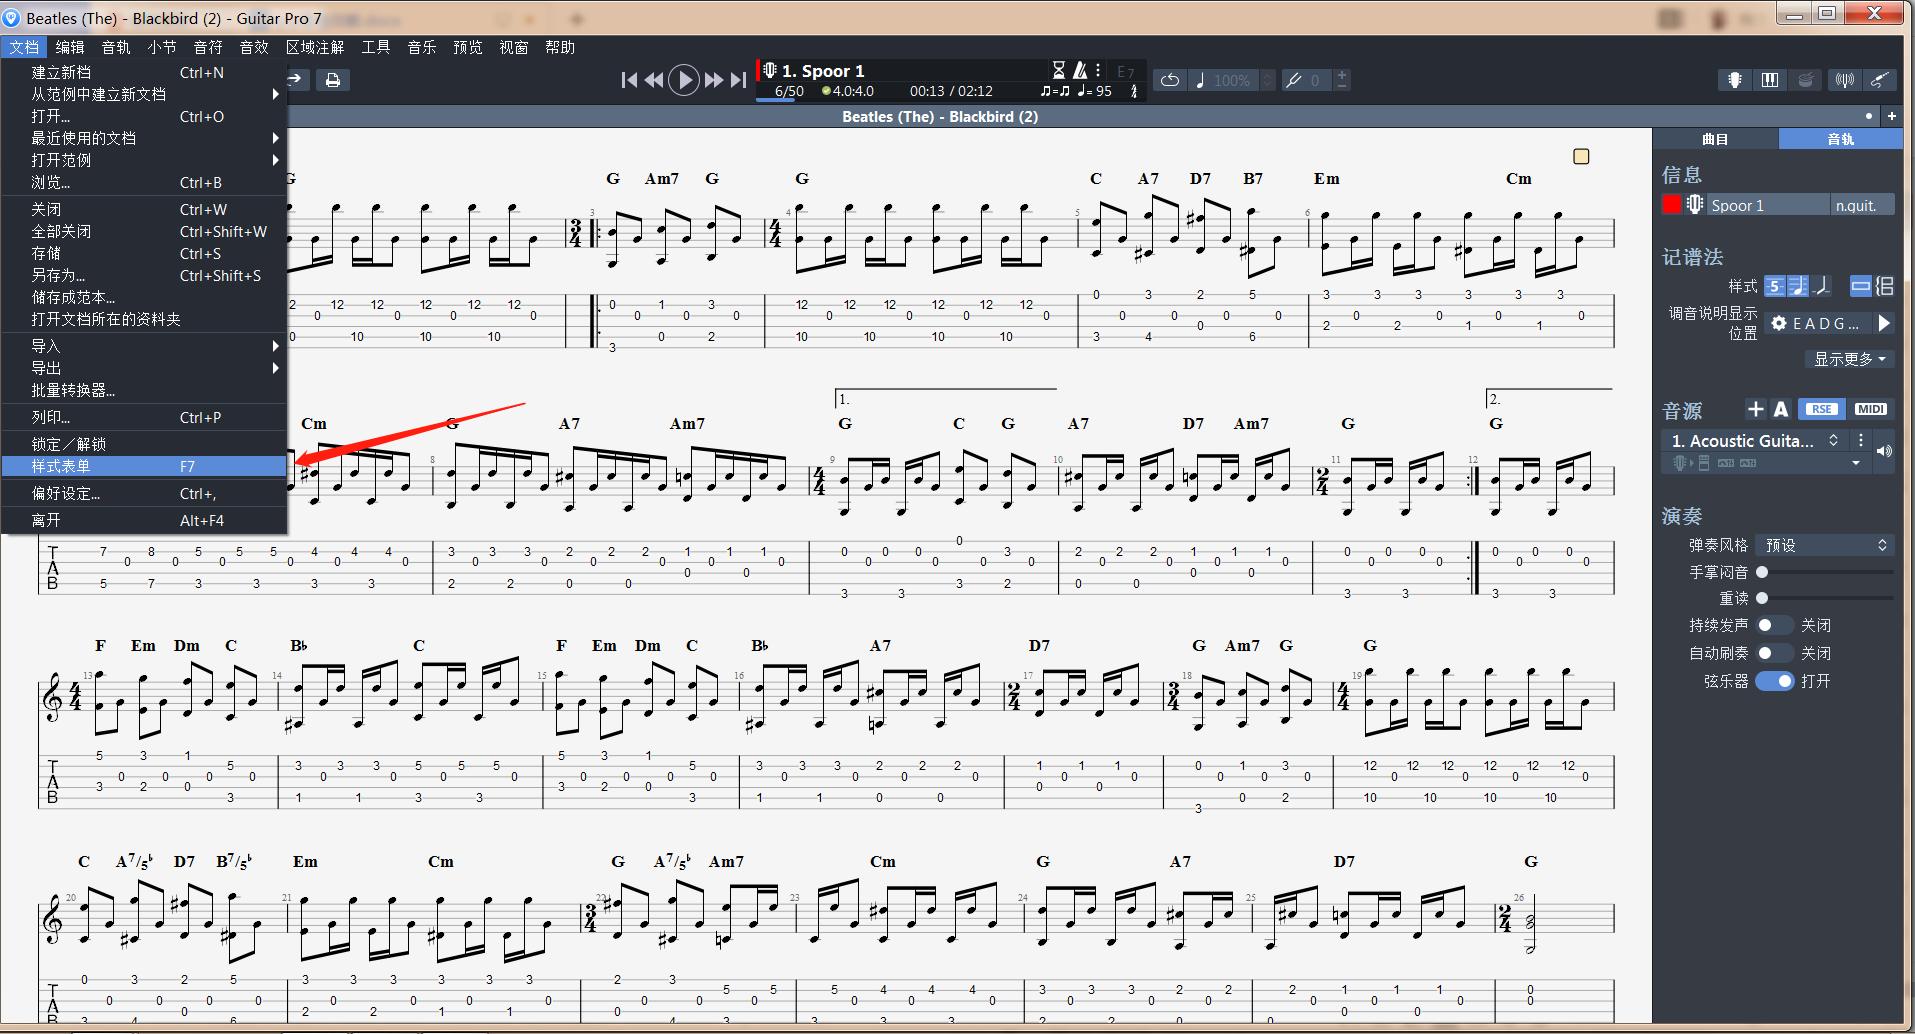 Guitar pro7样式表单选择界面